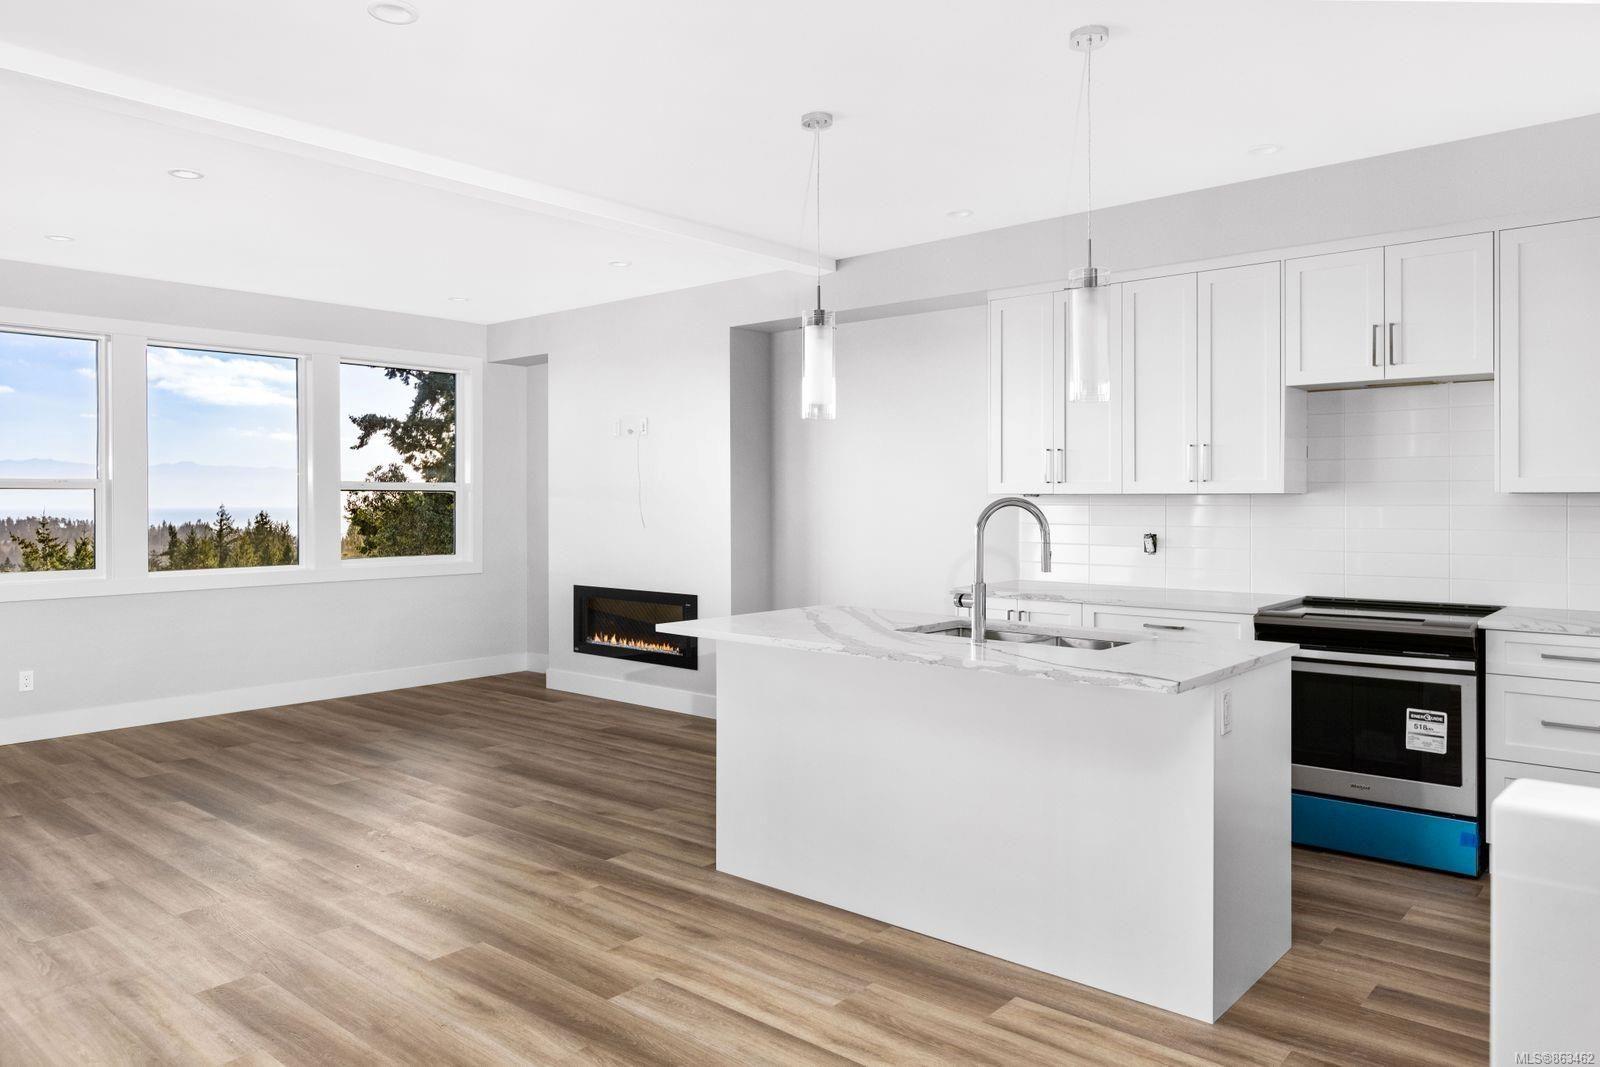 Main Photo: 7043 Brailsford Pl in : Sk Broomhill Half Duplex for sale (Sooke)  : MLS®# 863462